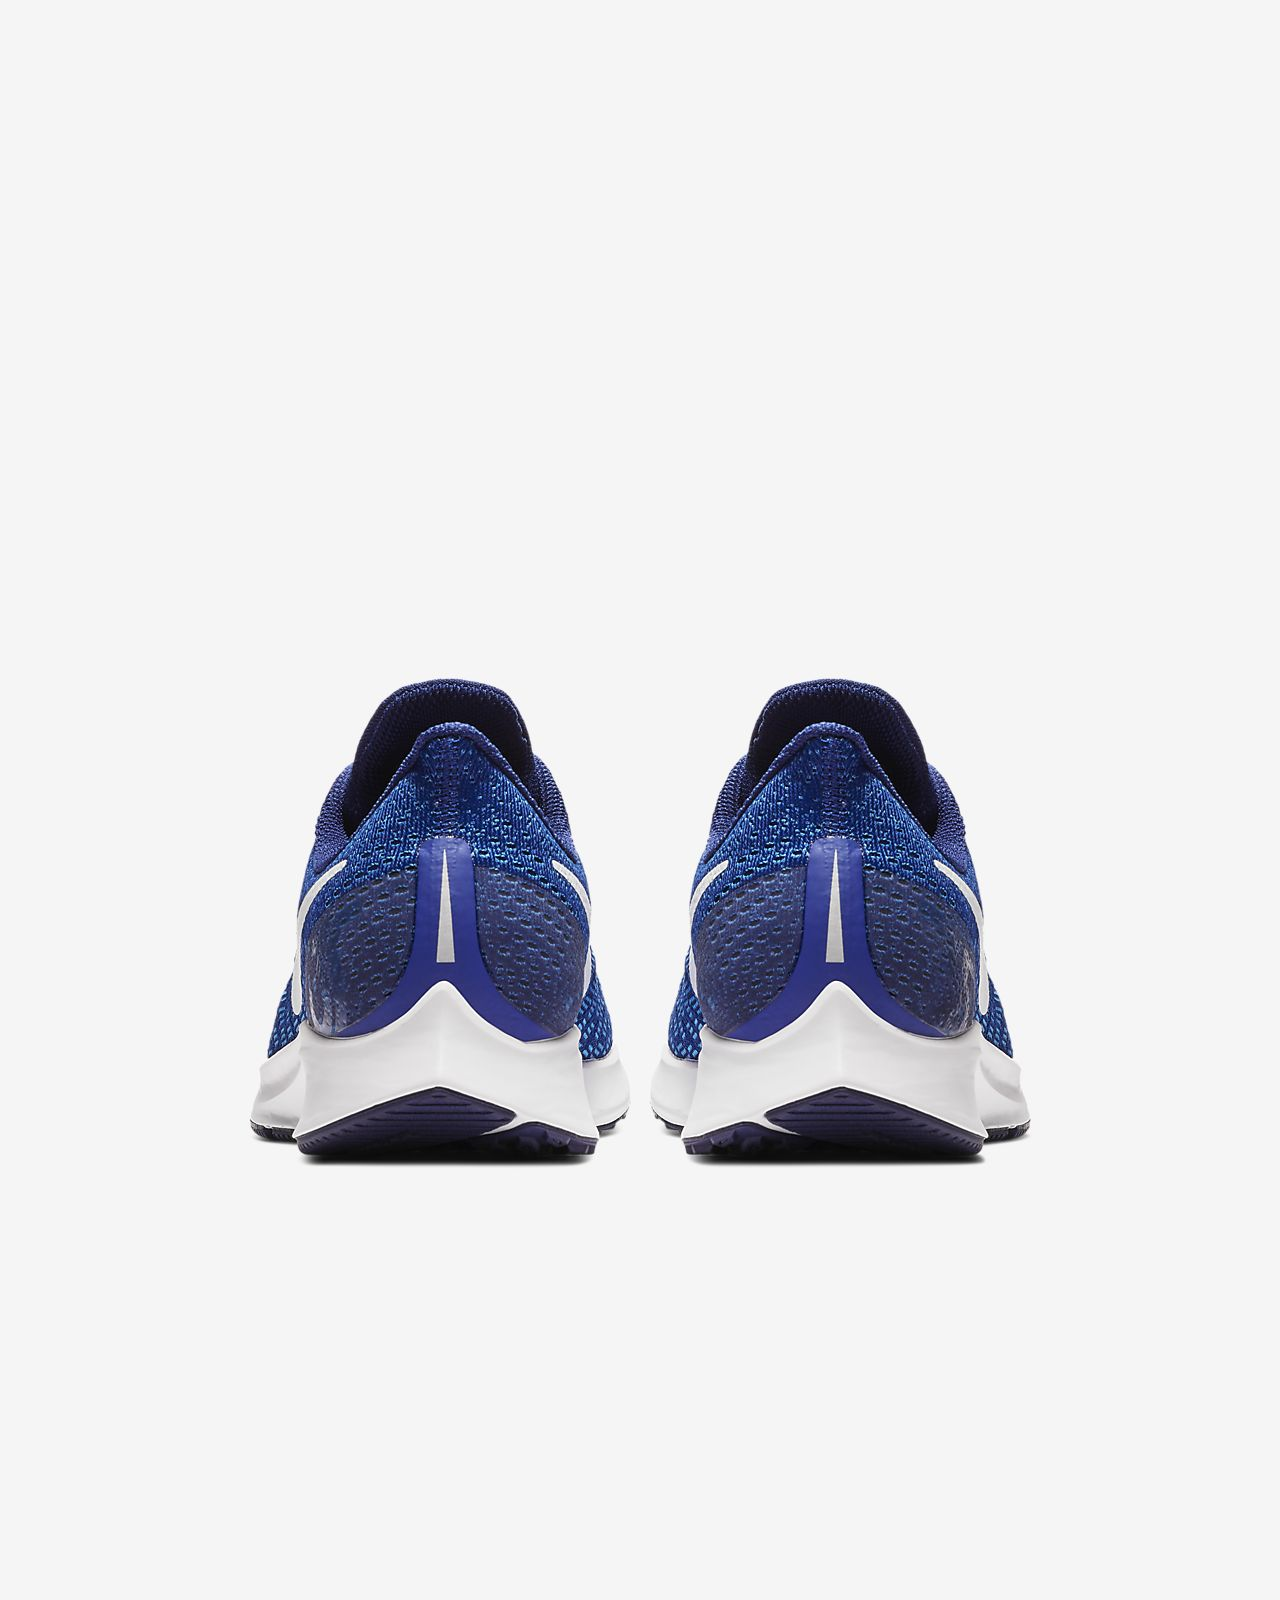 online store cf174 85225 ... Calzado de running para hombre Nike Air Zoom Pegasus 35